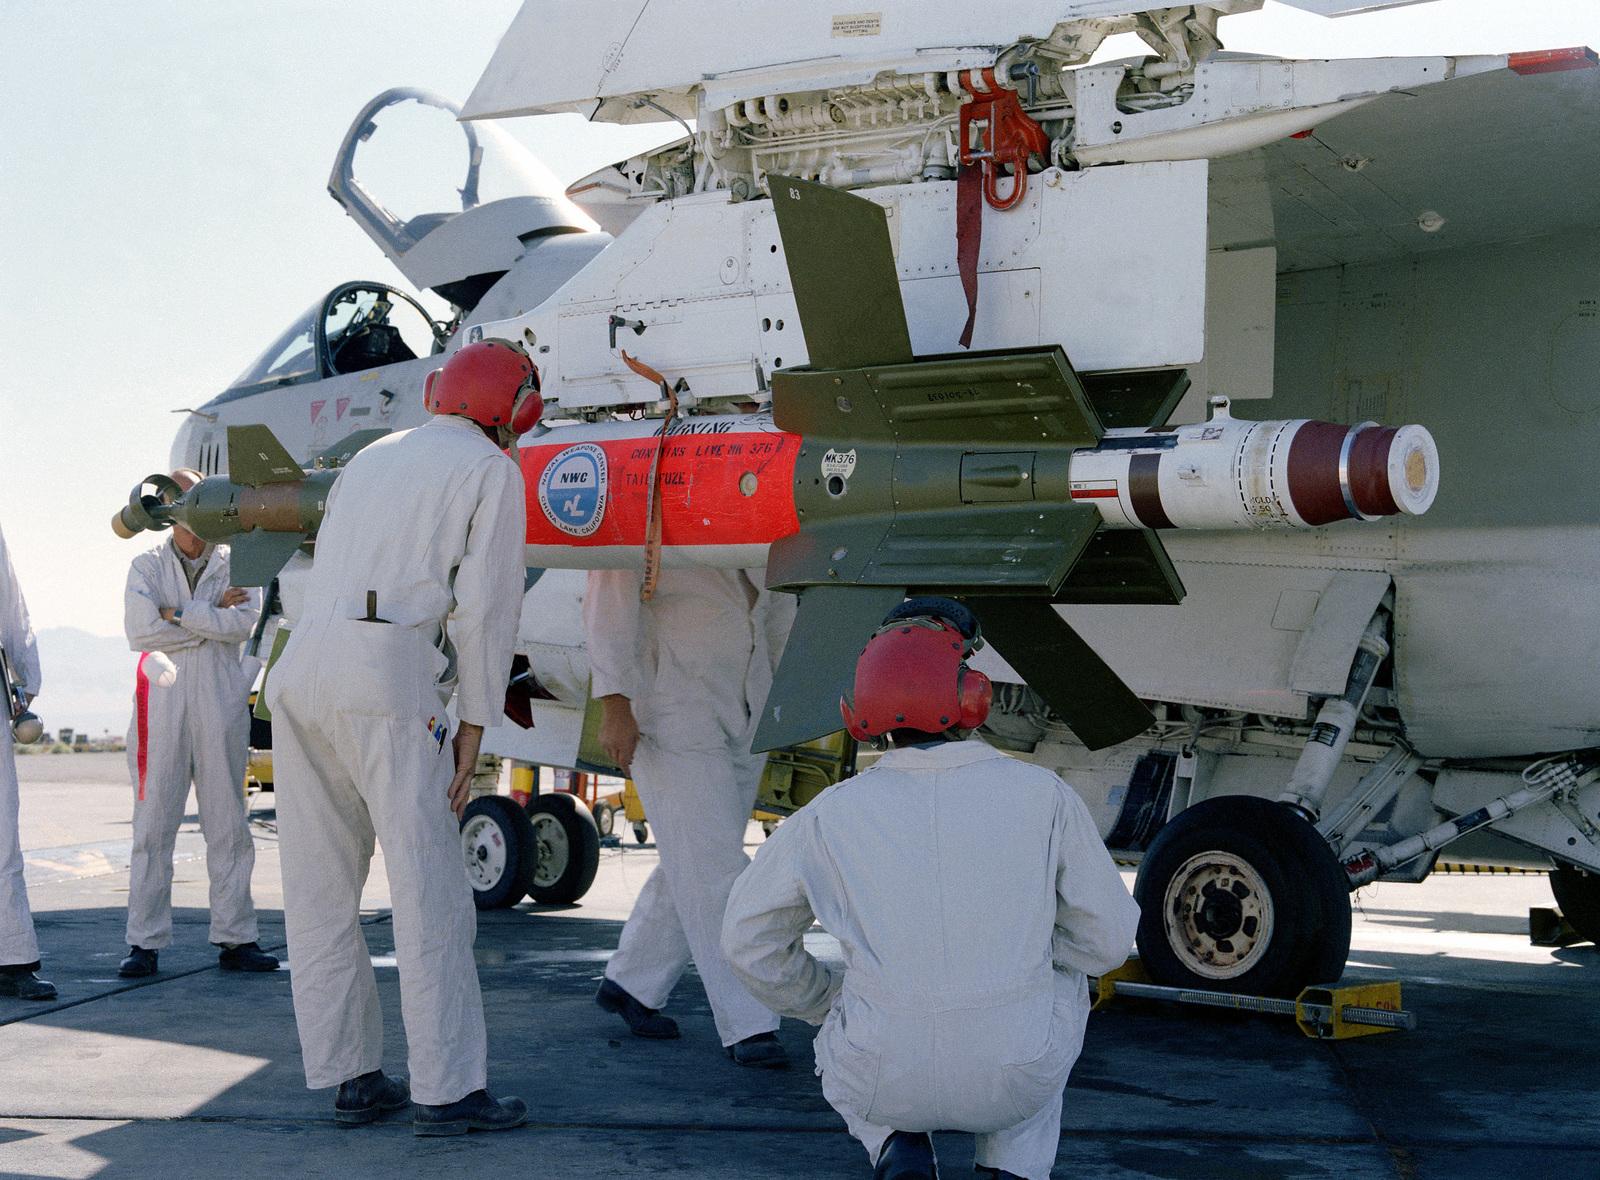 An A-7 Corsair II aircraft crew mounts a Skipper II laser guided bomb on the plane